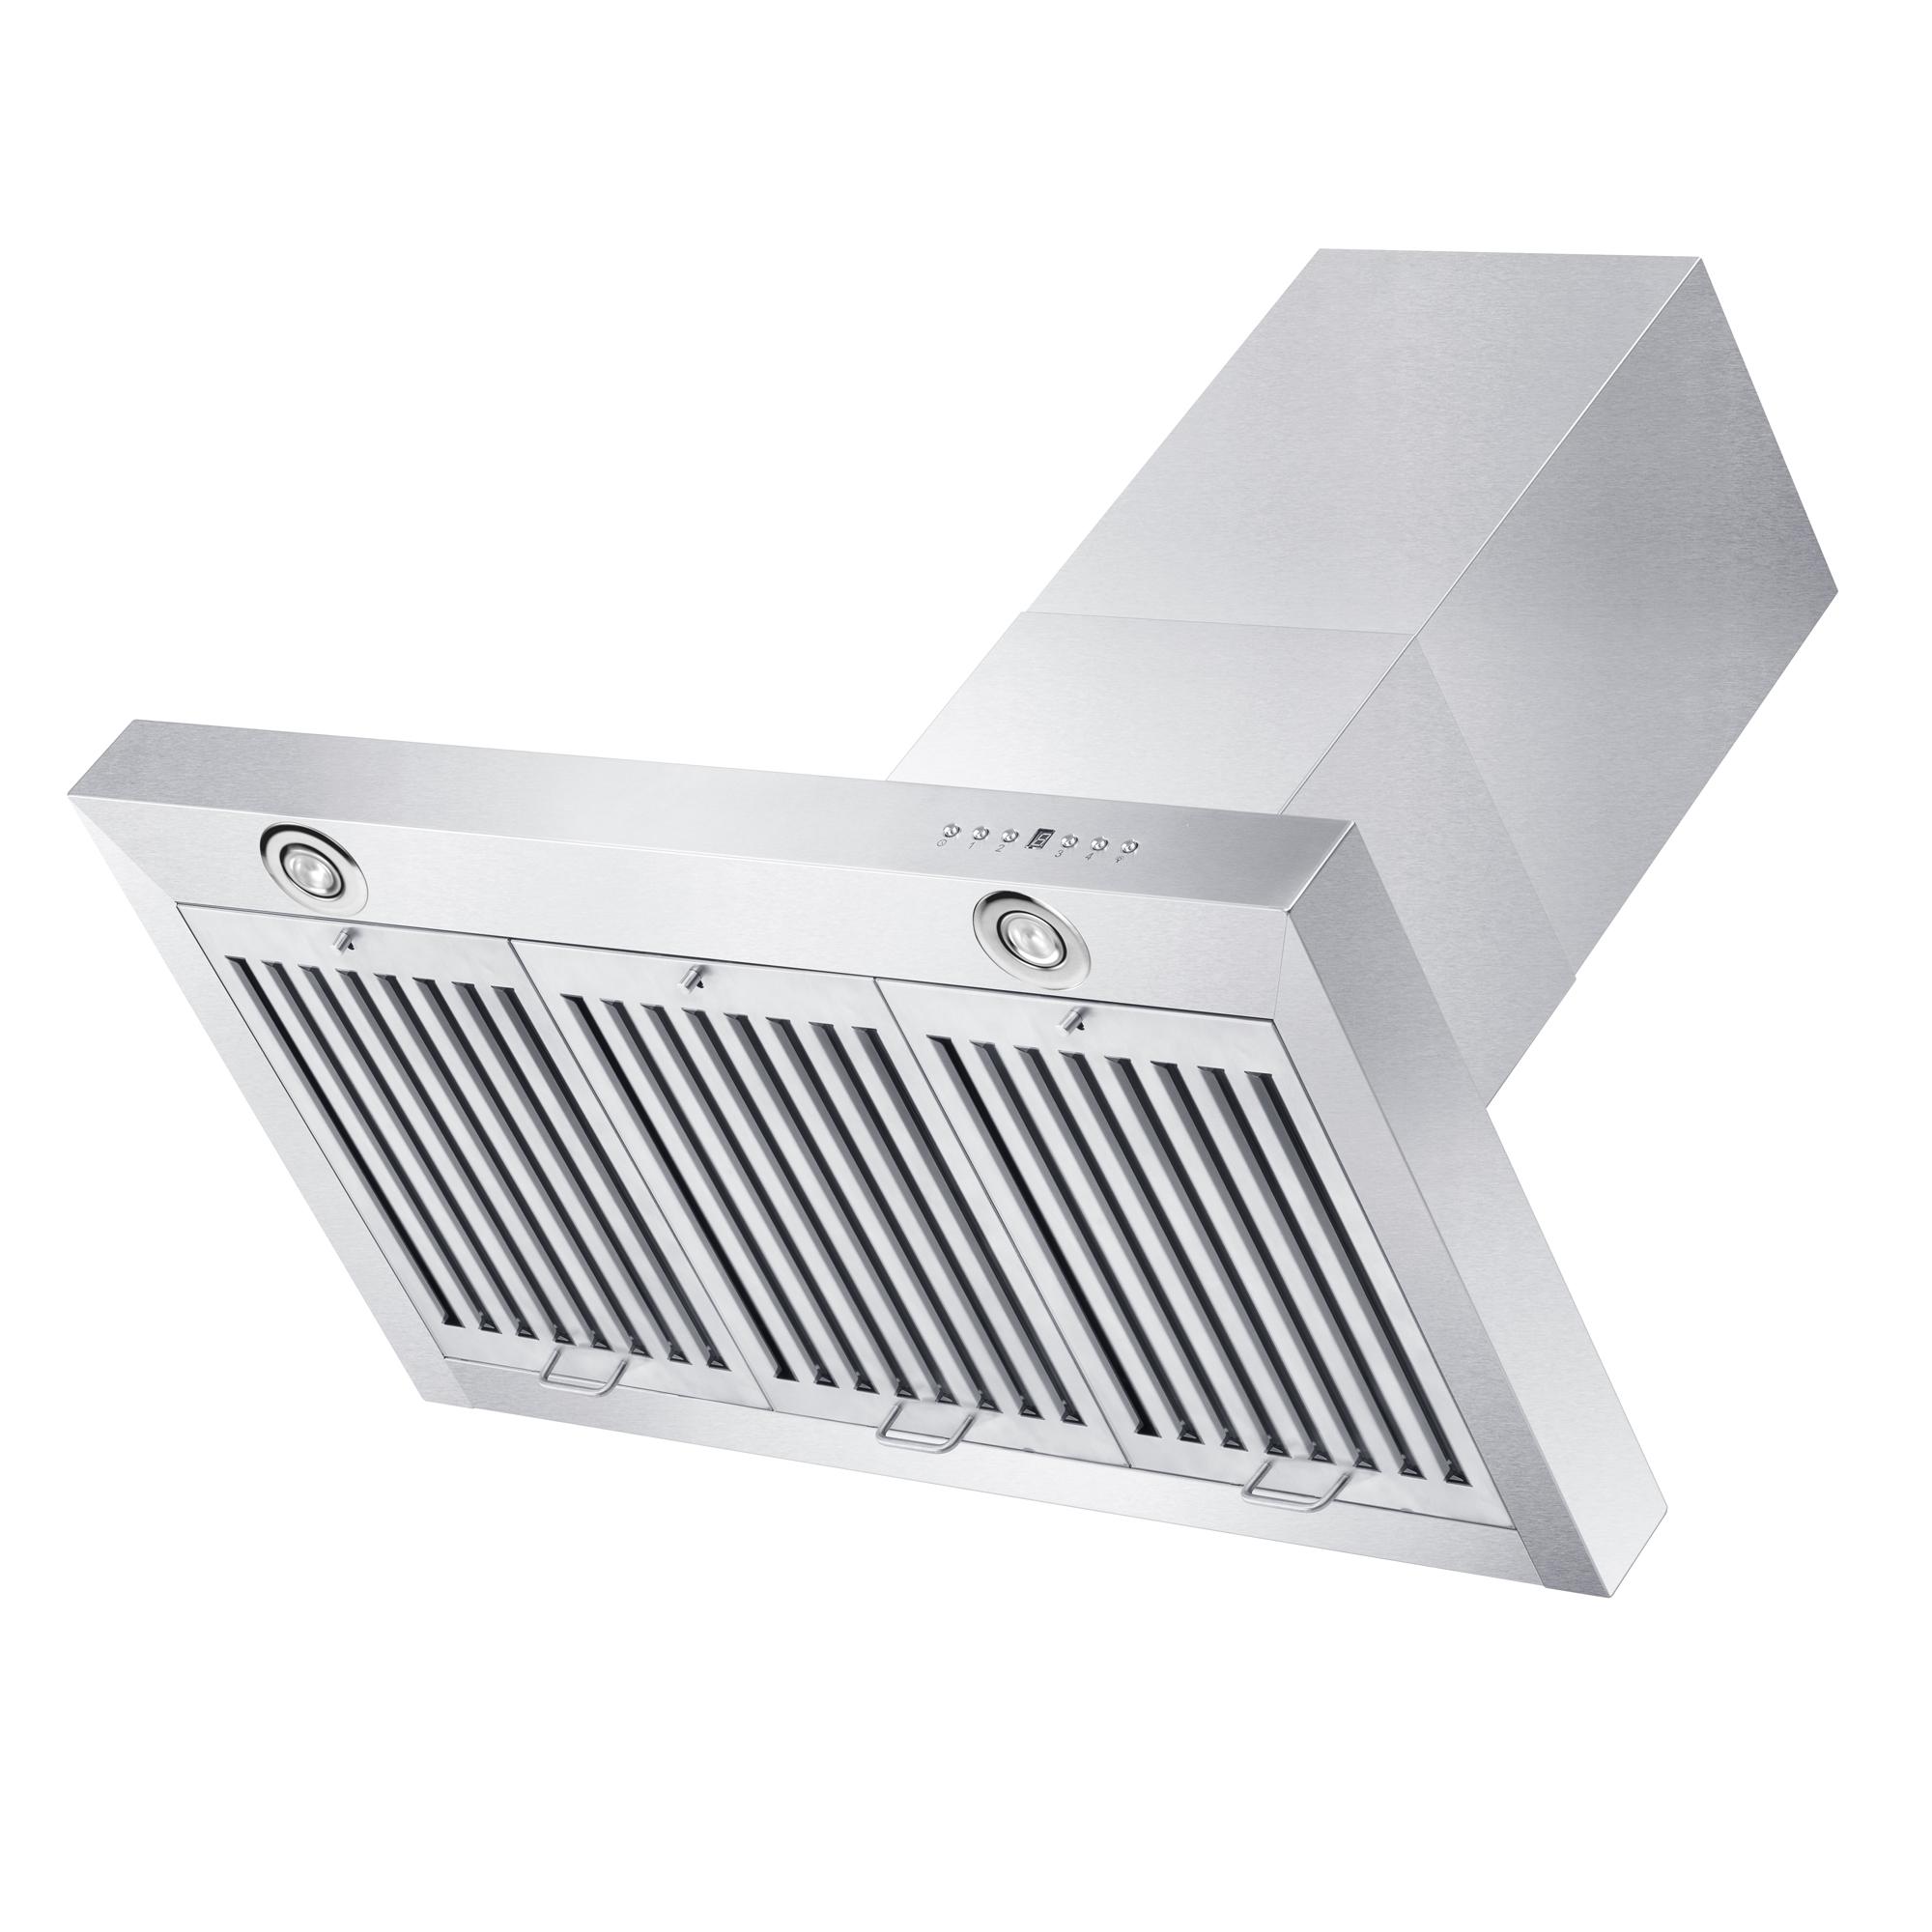 zline-stainless-steel-wall-mounted-range-hood-KE-new-side-under.jpg